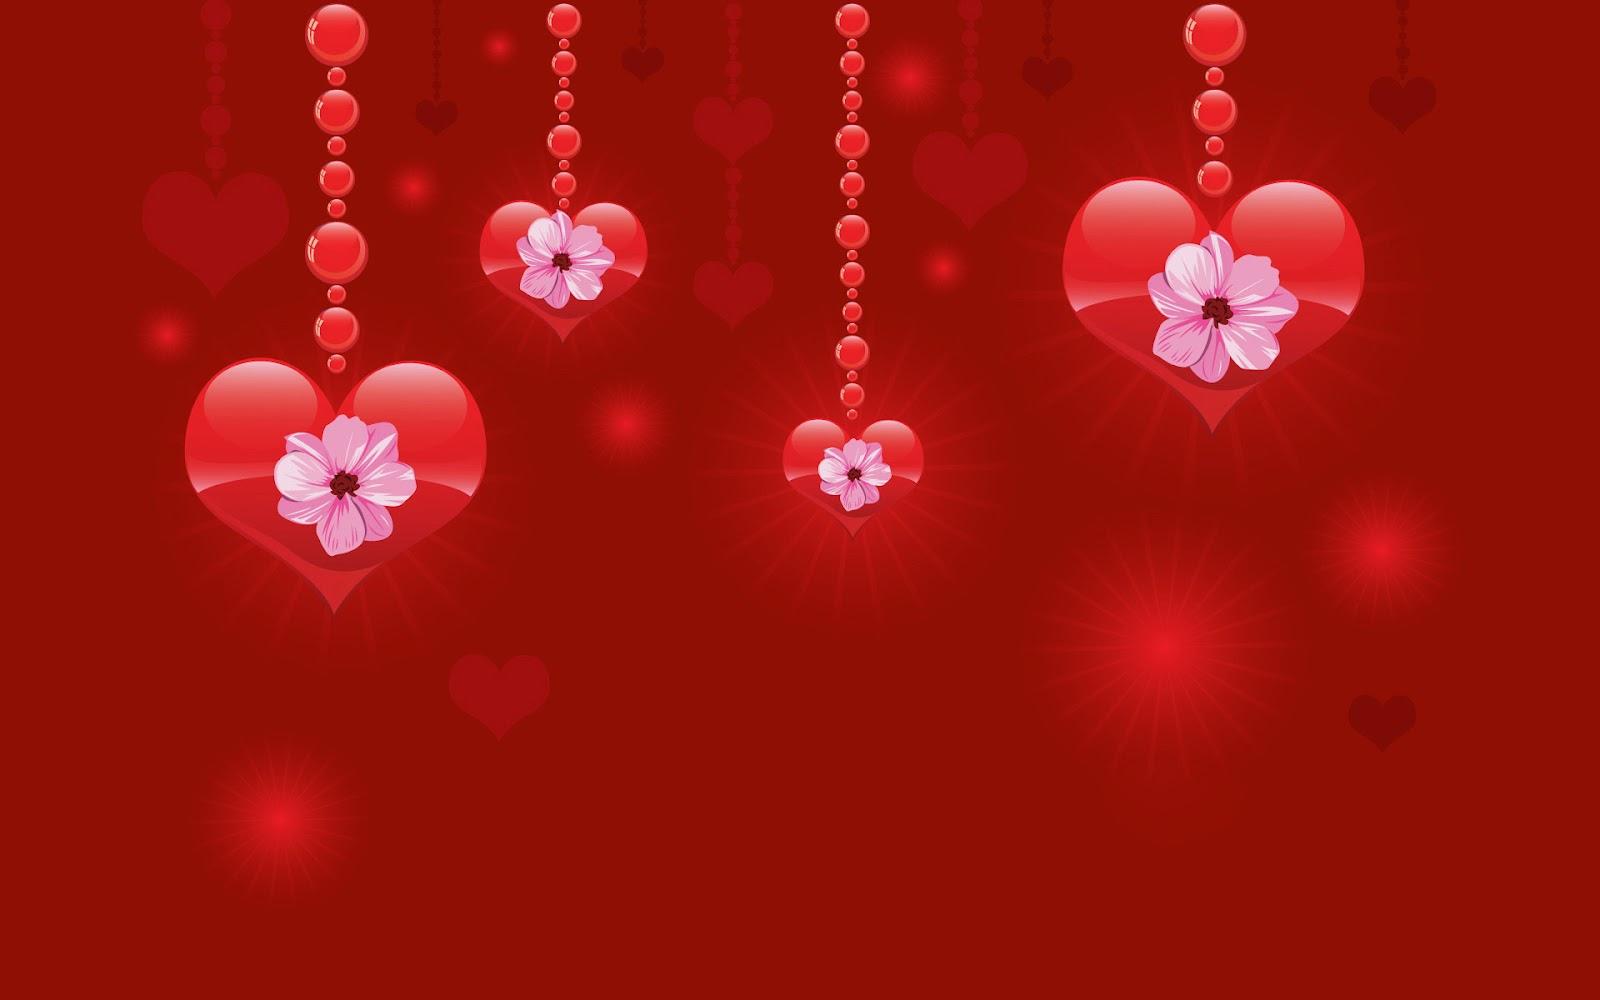 Valentines Day Wallpapers 2013   2014 ImageBankbiz 1600x1000